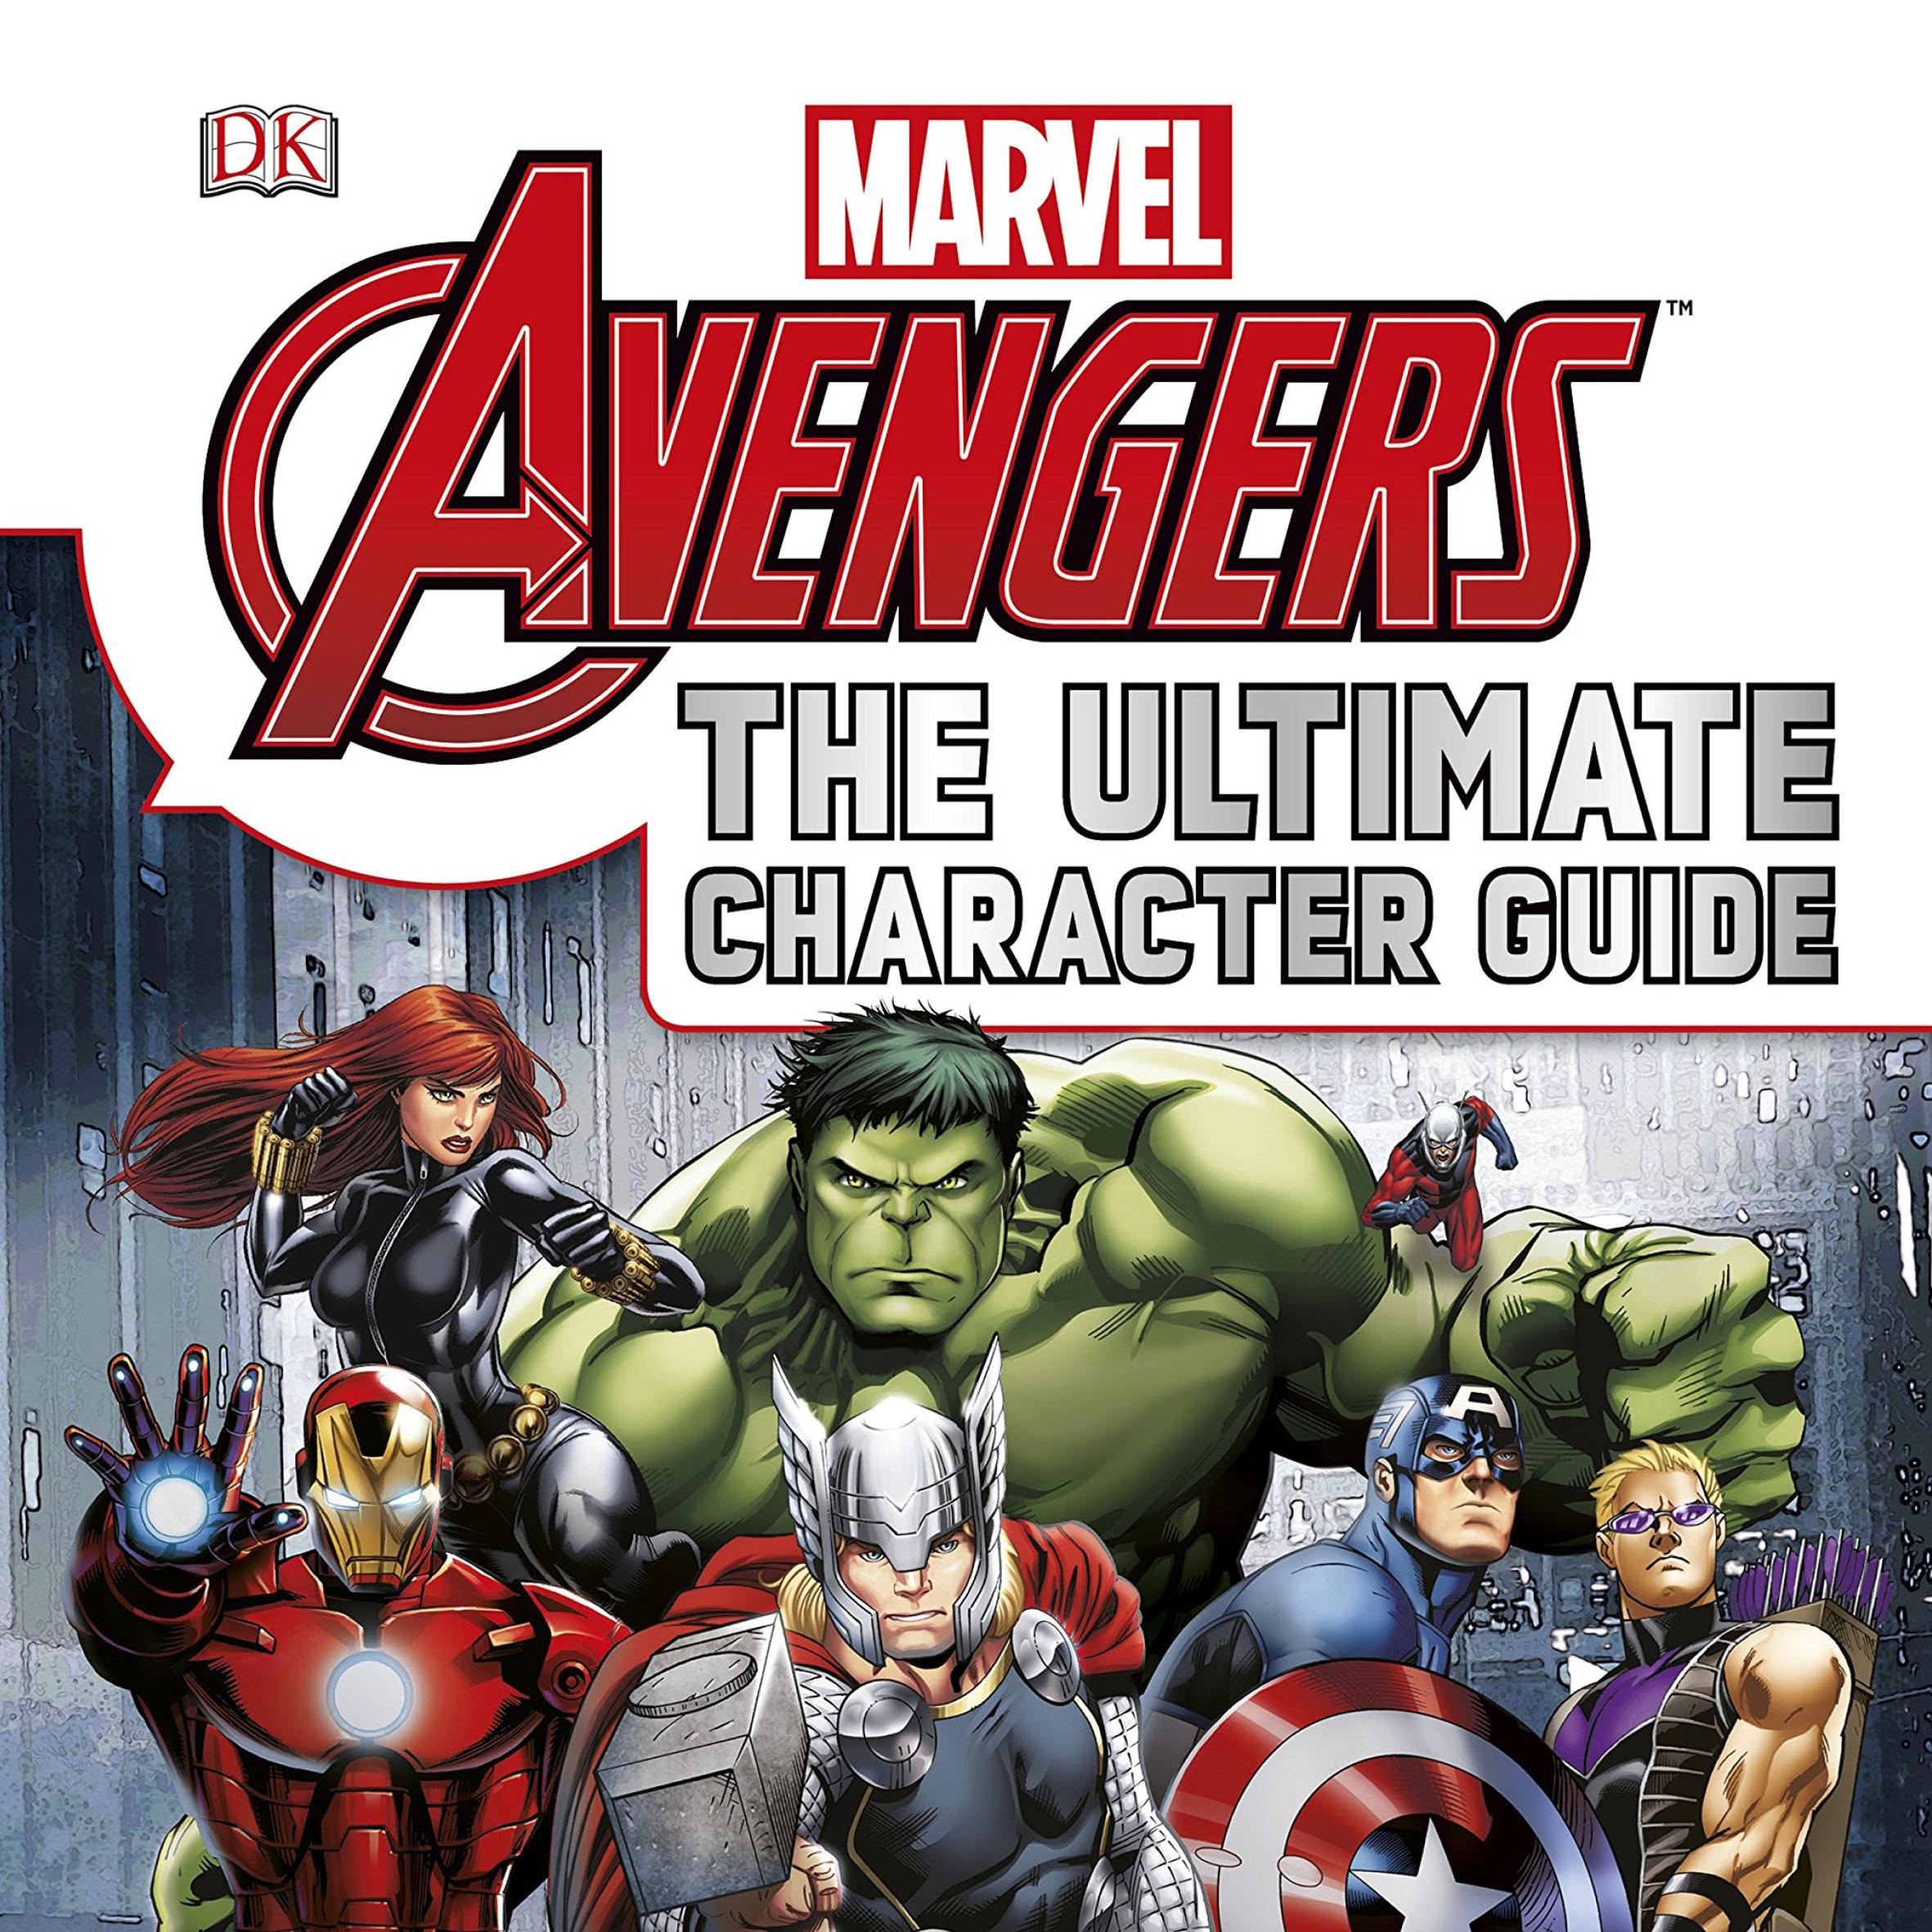 2 Dynamo Avengers char guide_THUMB